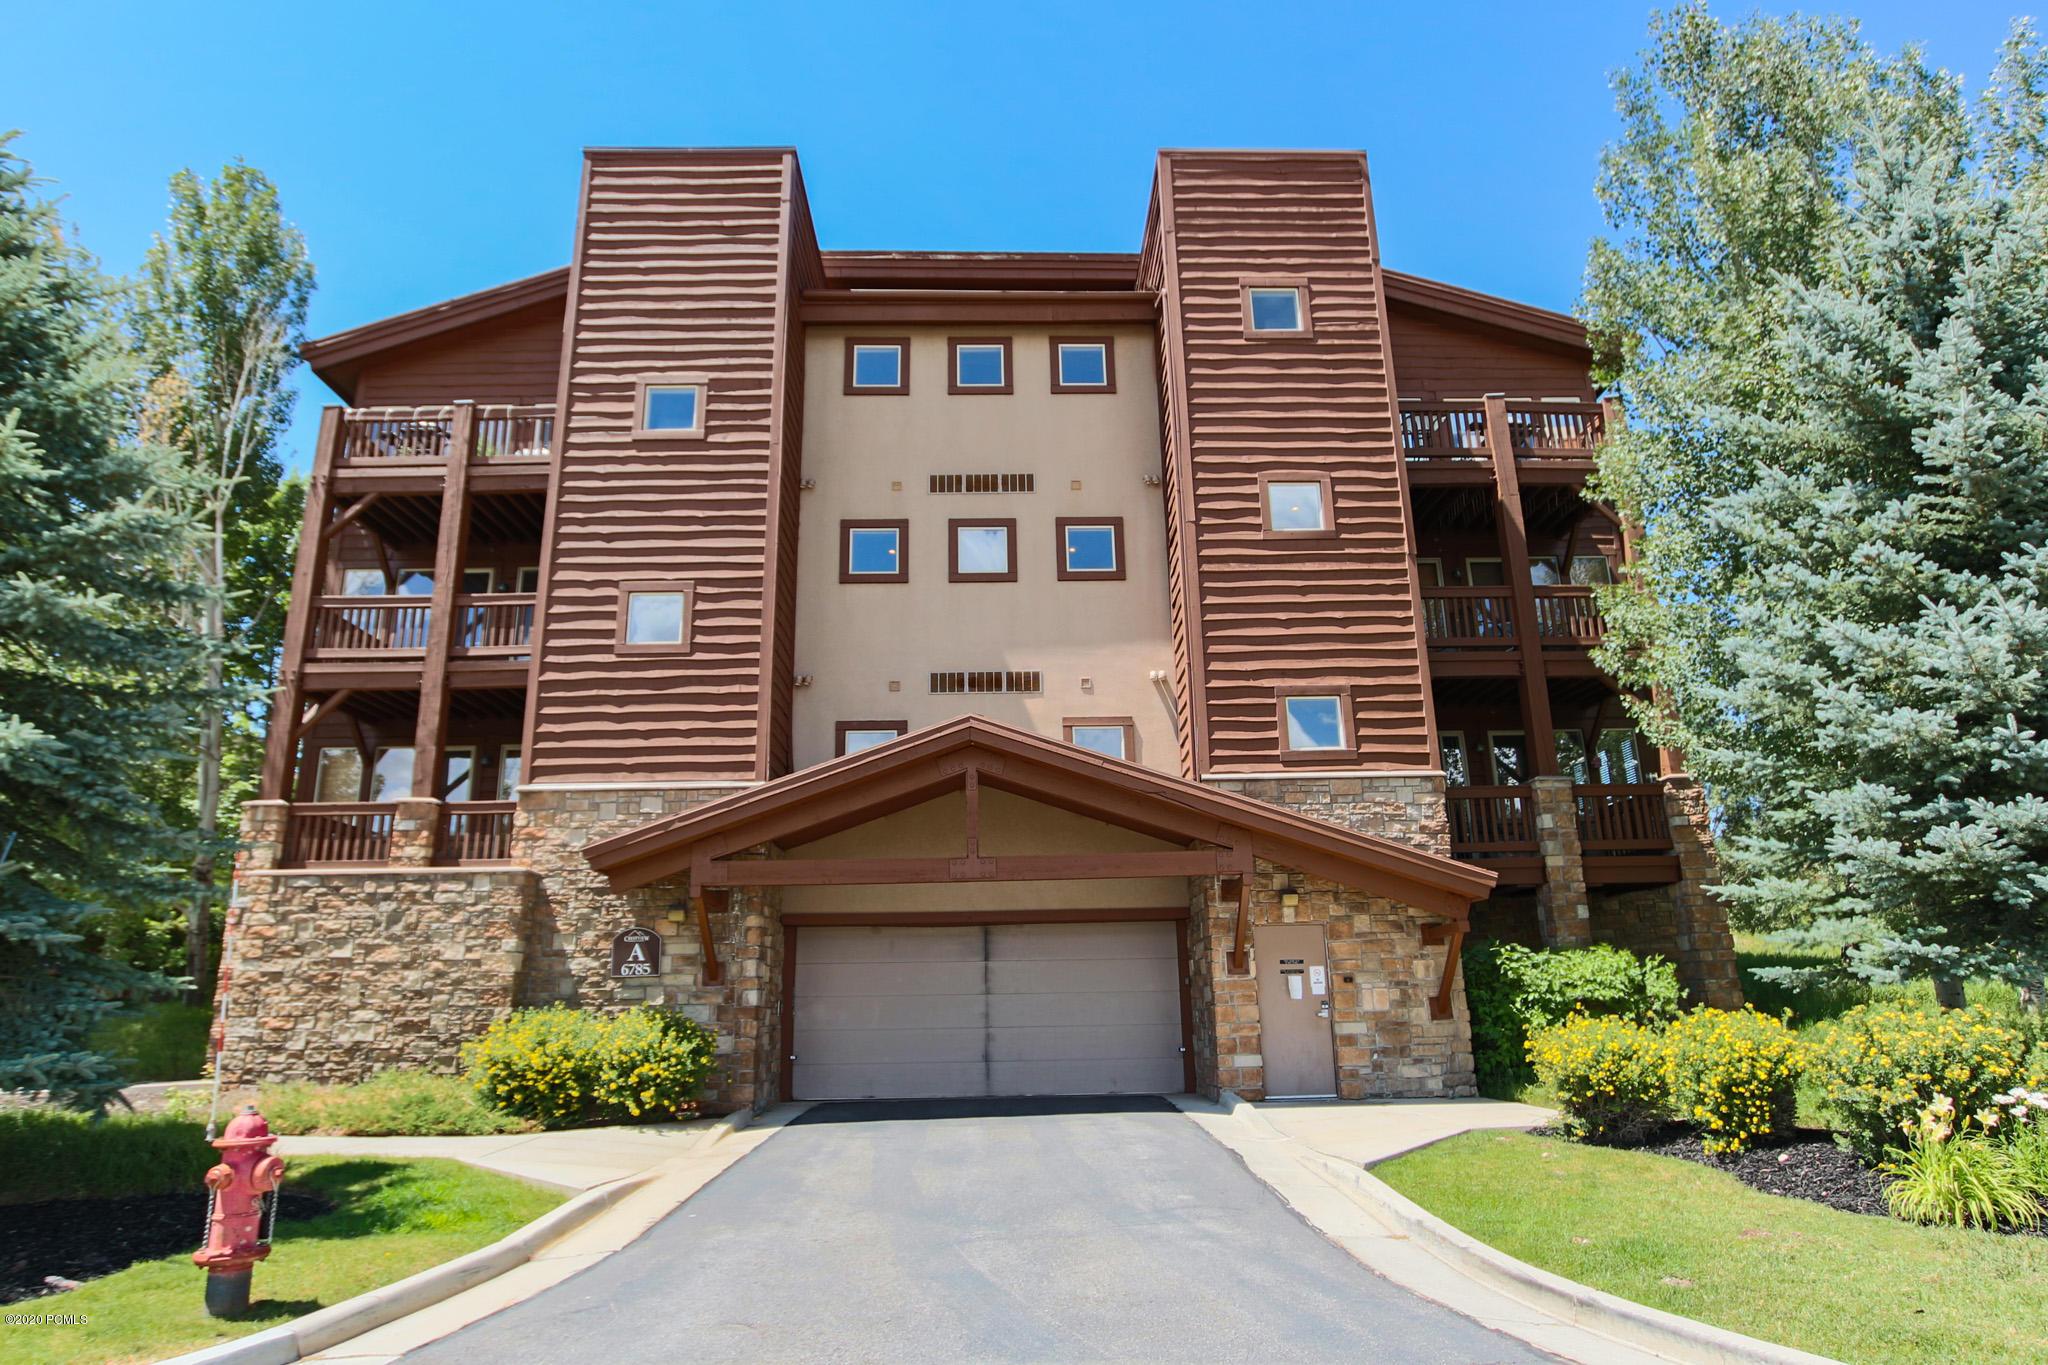 6785 2200 W, Park City, Utah 84098, 2 Bedrooms Bedrooms, ,2 BathroomsBathrooms,Condominium,For Sale,2200 W,12002709